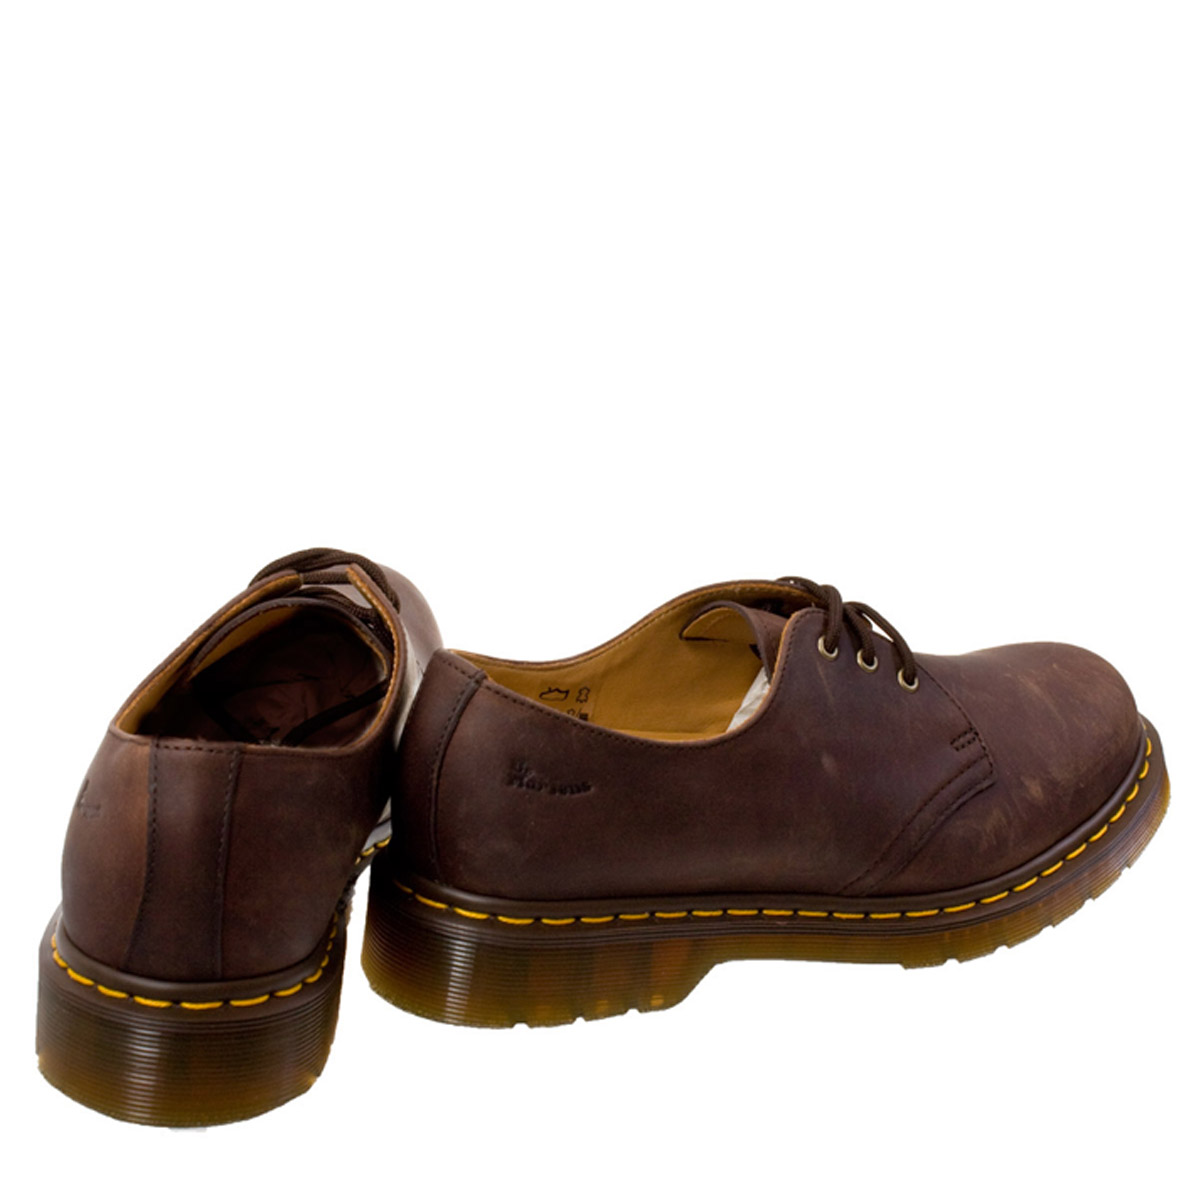 b979bc27f43 Details about Dr. Martens Unisex 1461 Shoes, Crazy Horse Gaucho Brown,  Leather, Lace Up, Docs